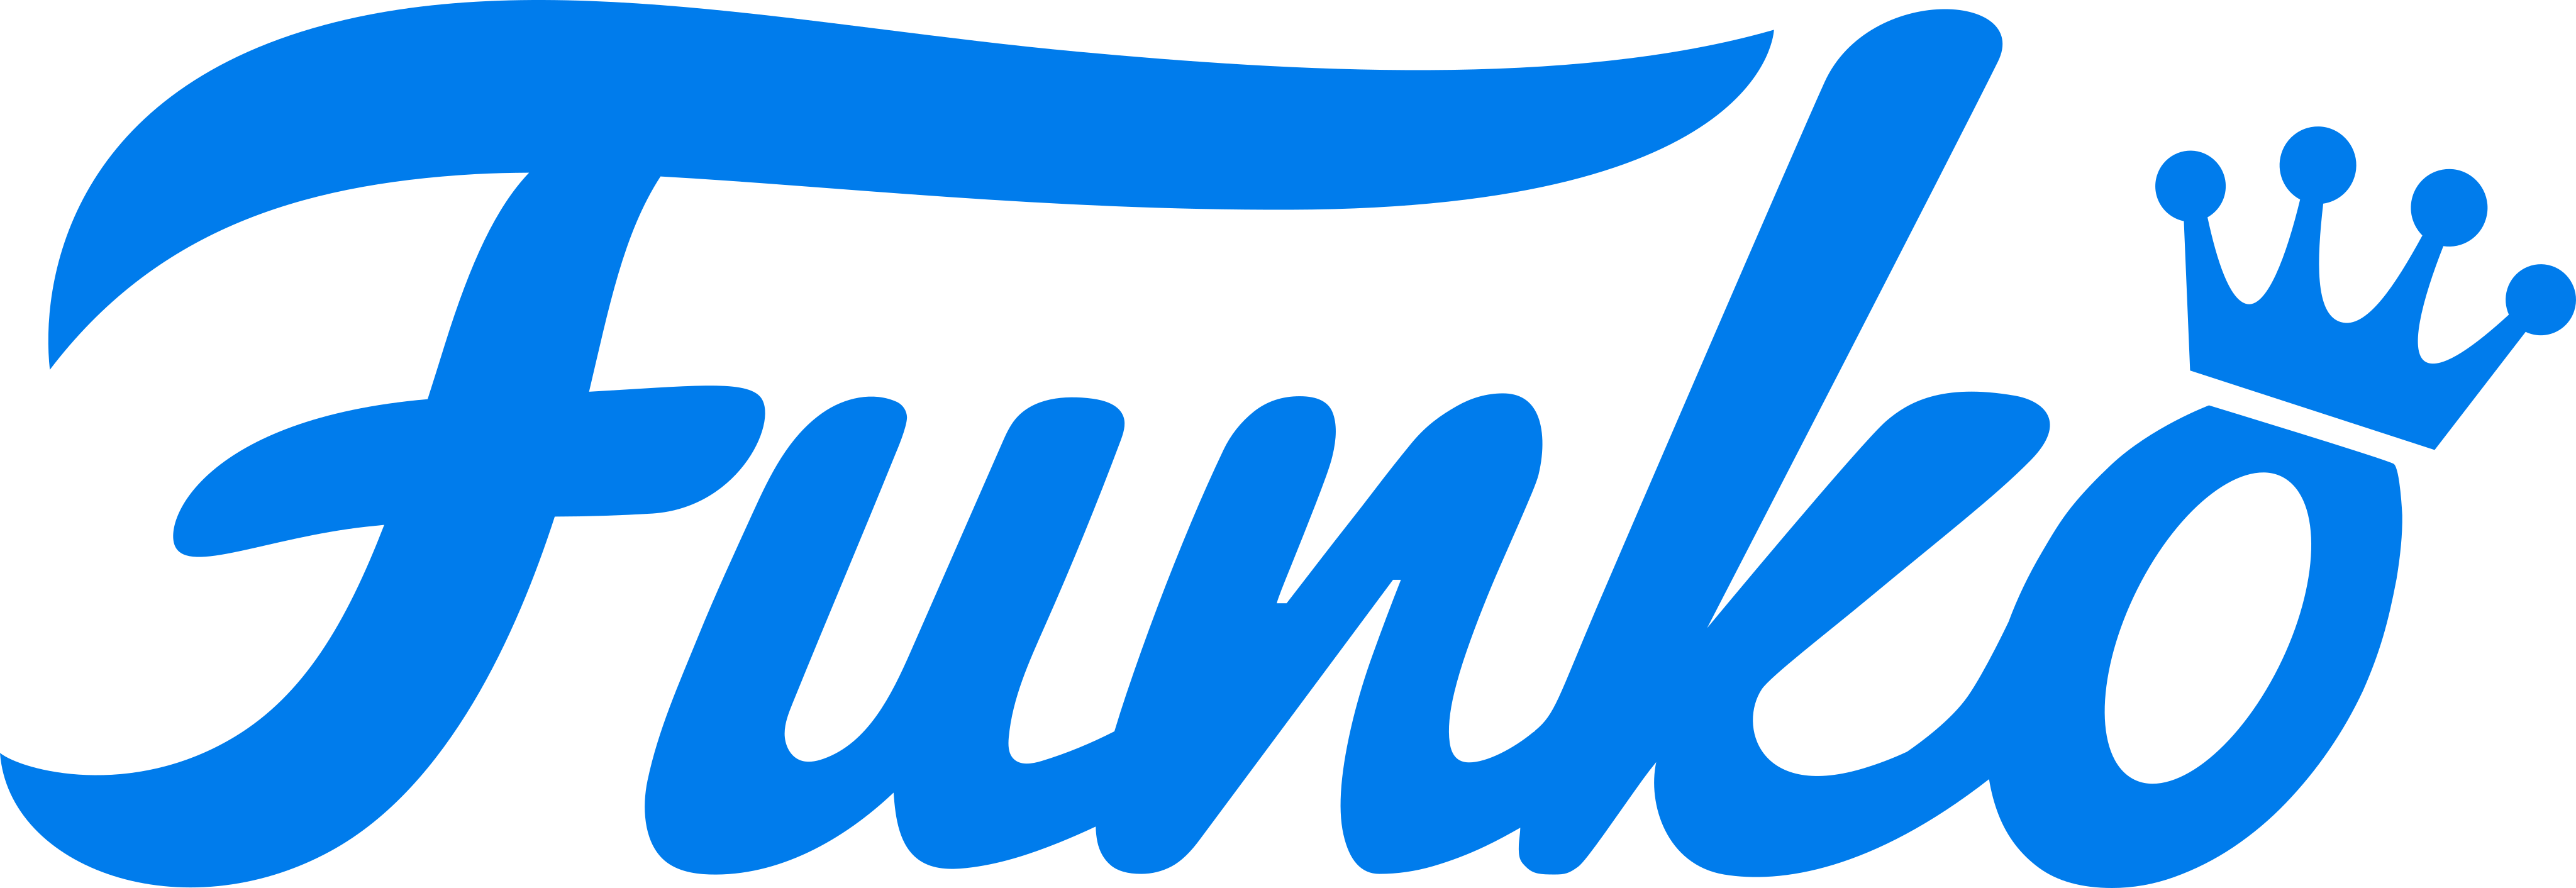 funko-logo-1.png